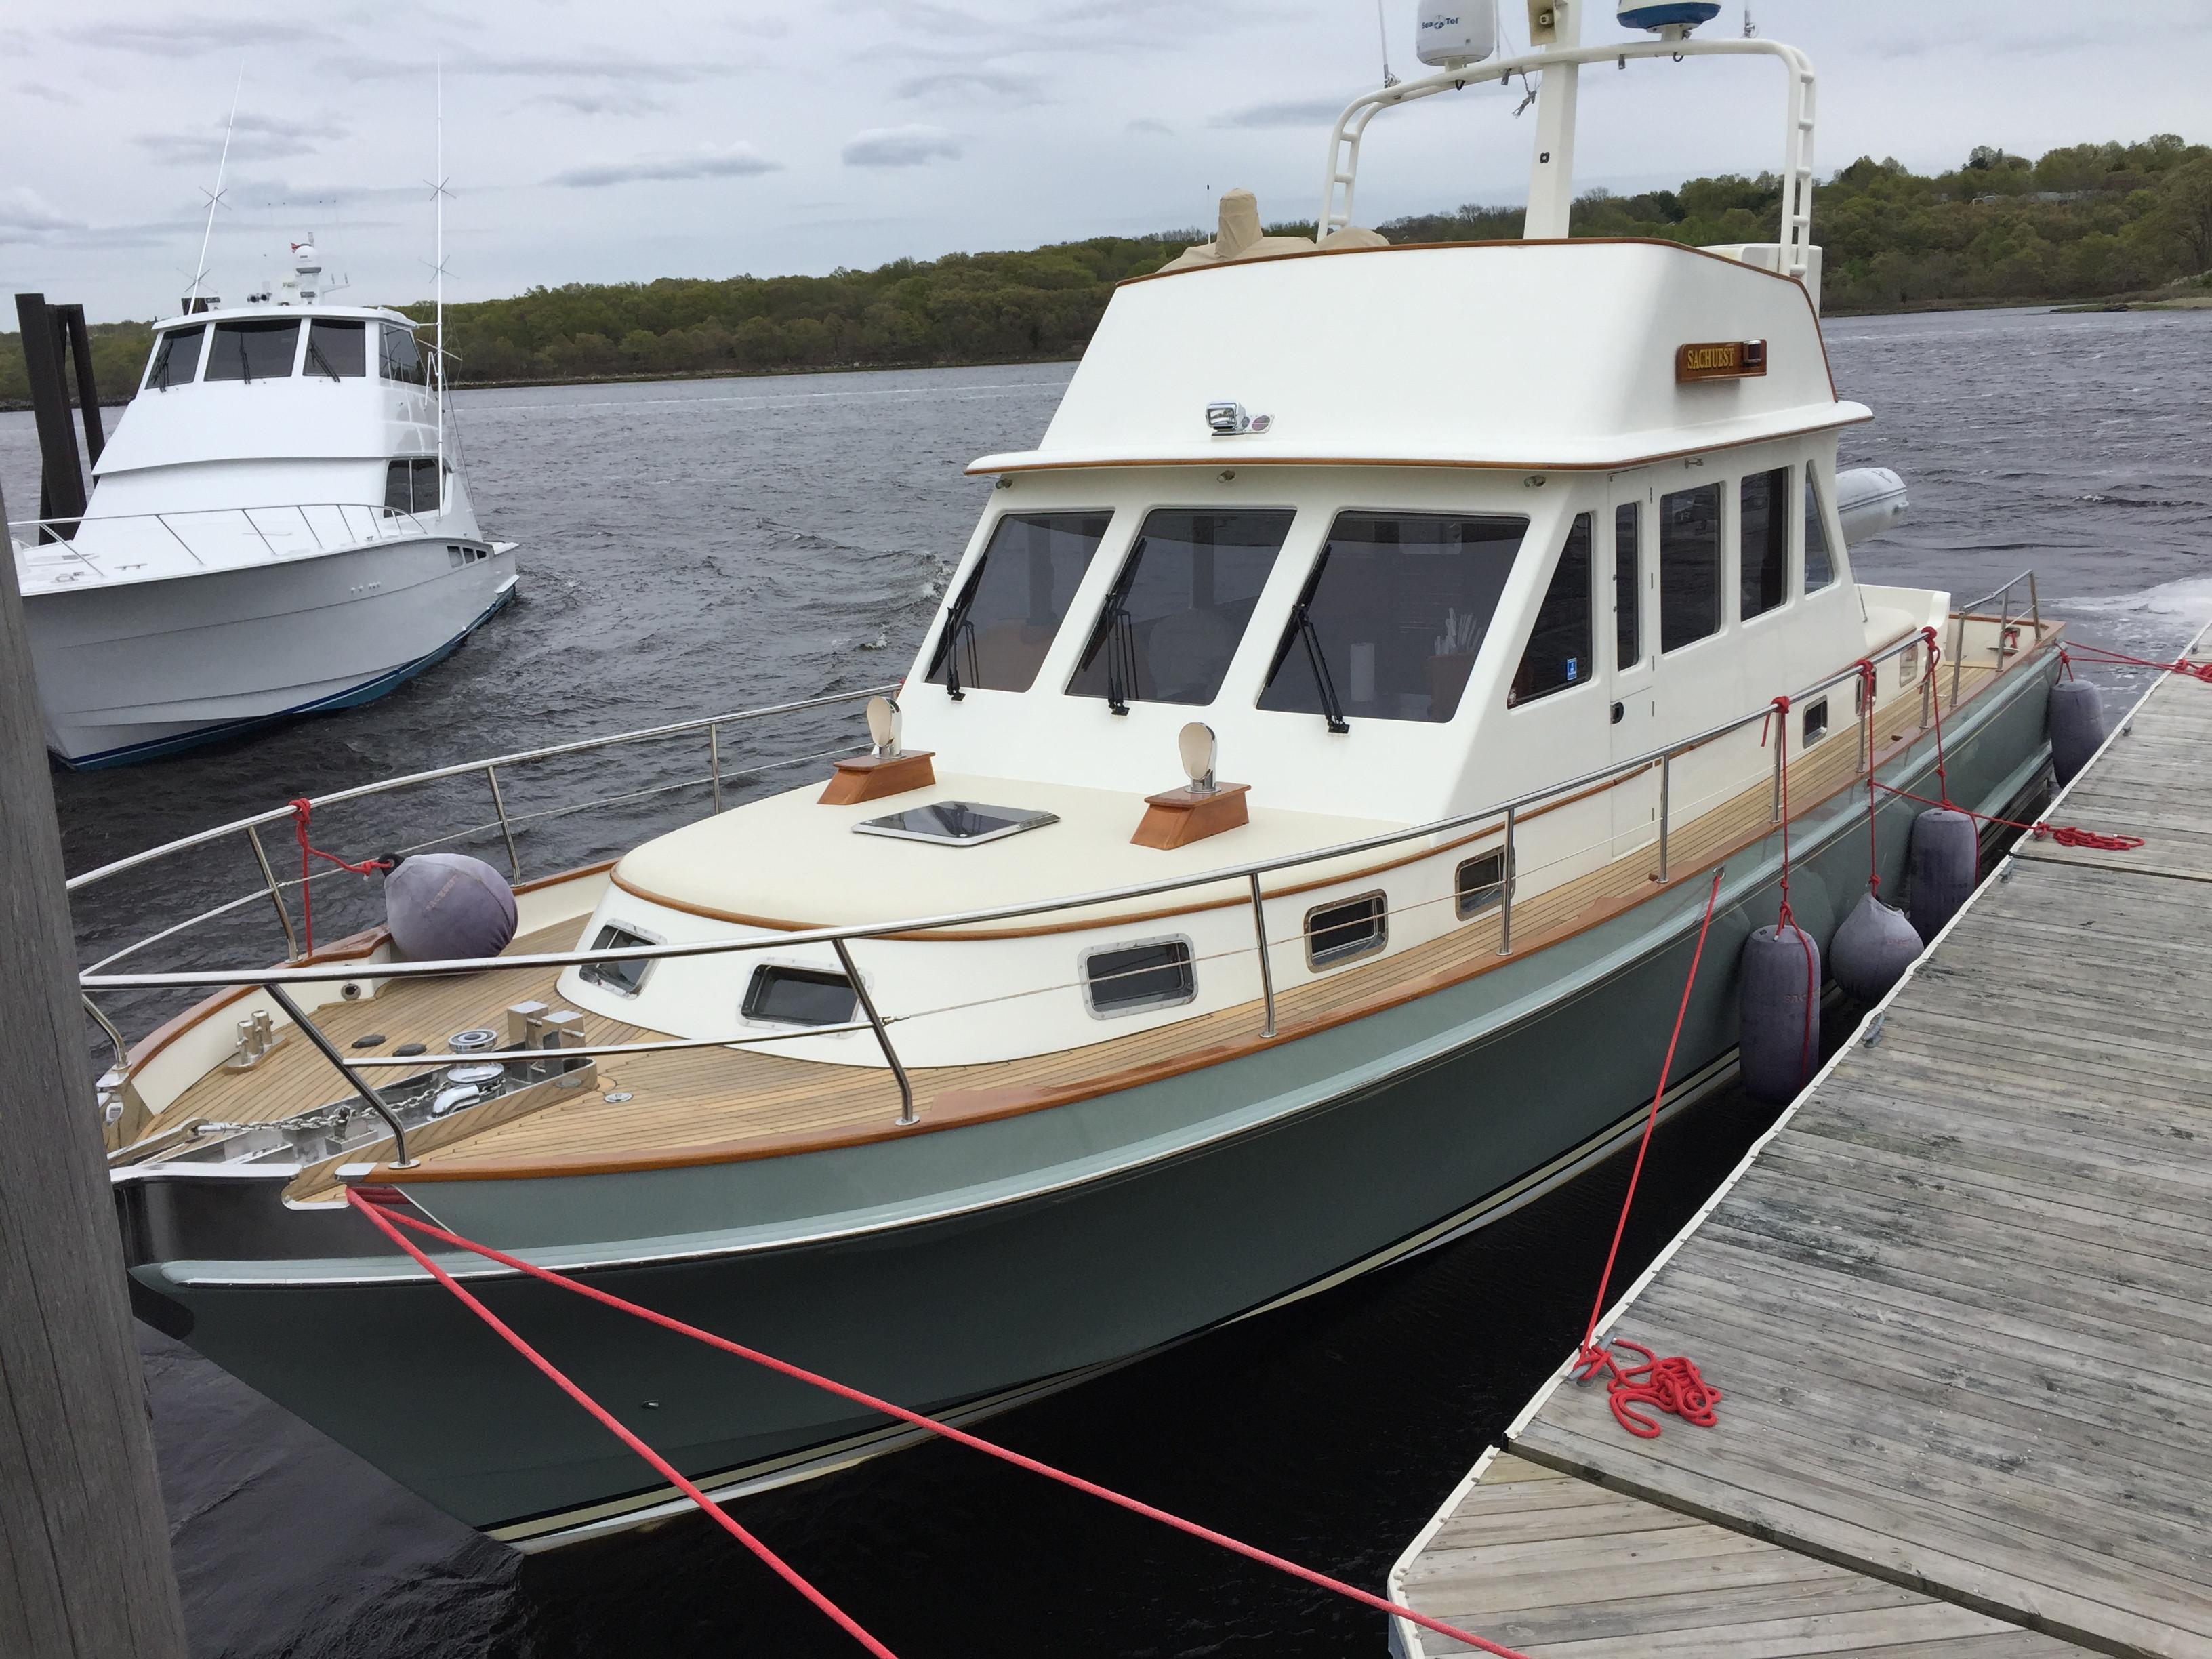 Profile on dock